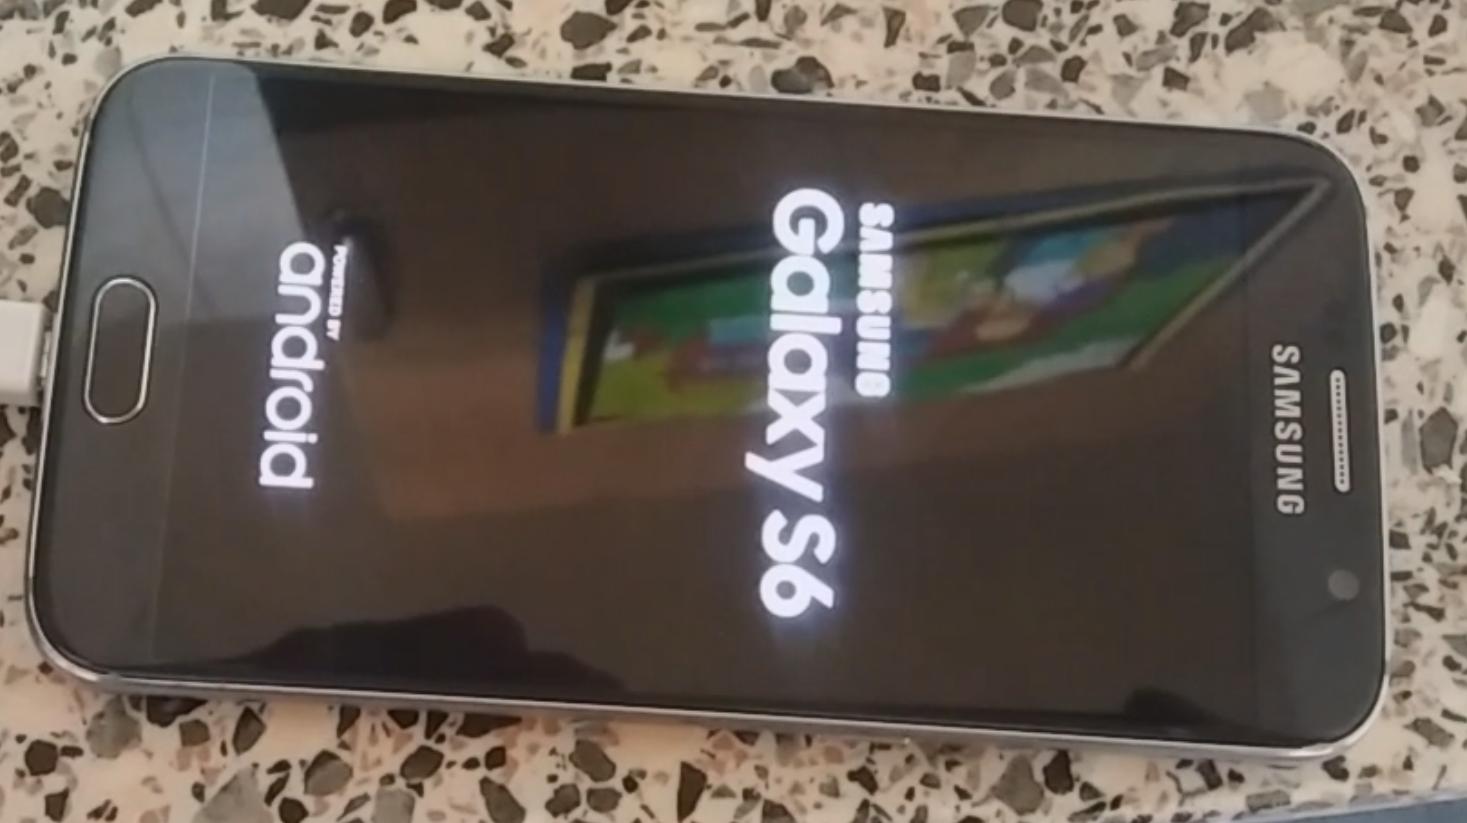 josh phone.PNG